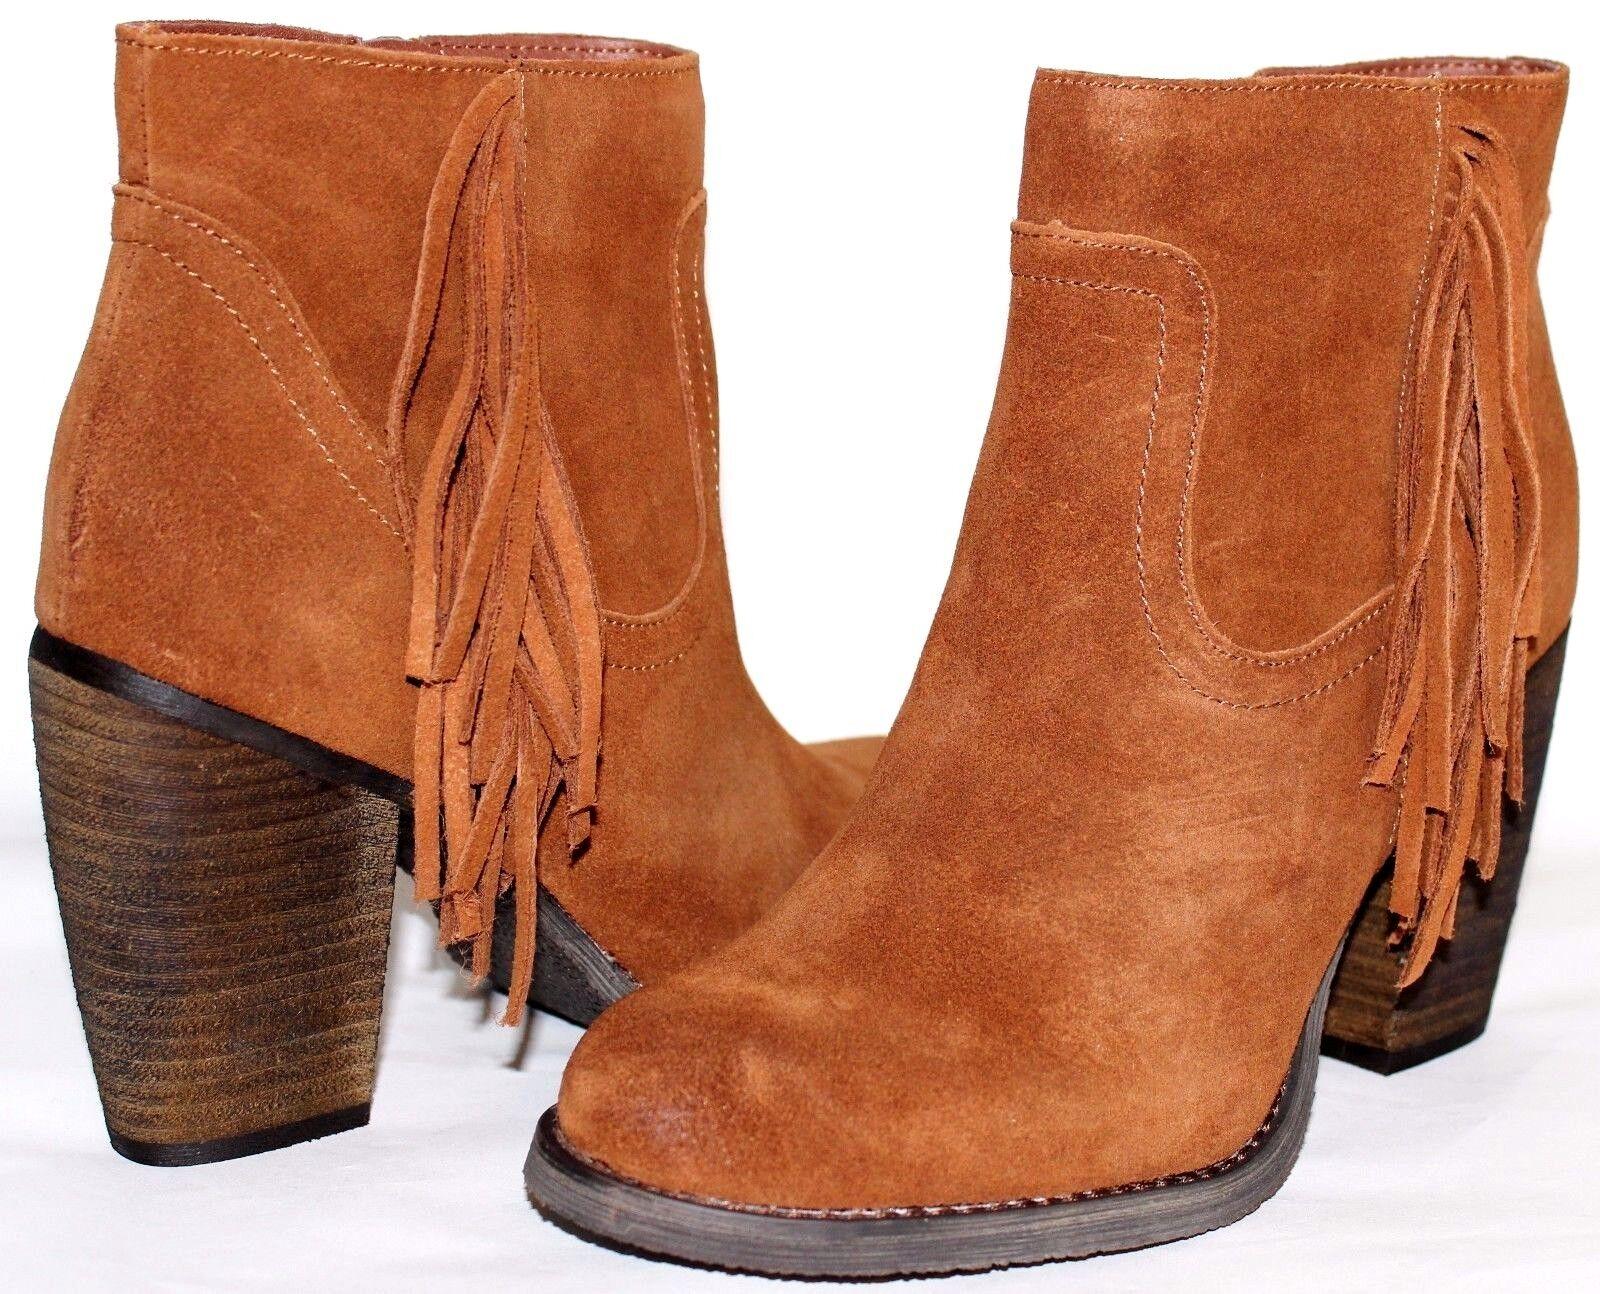 SBICCA Marimba Fringe Whiskey Premium Suede 3.5  Heel Zip Boot 8.5 M NEW L@@K